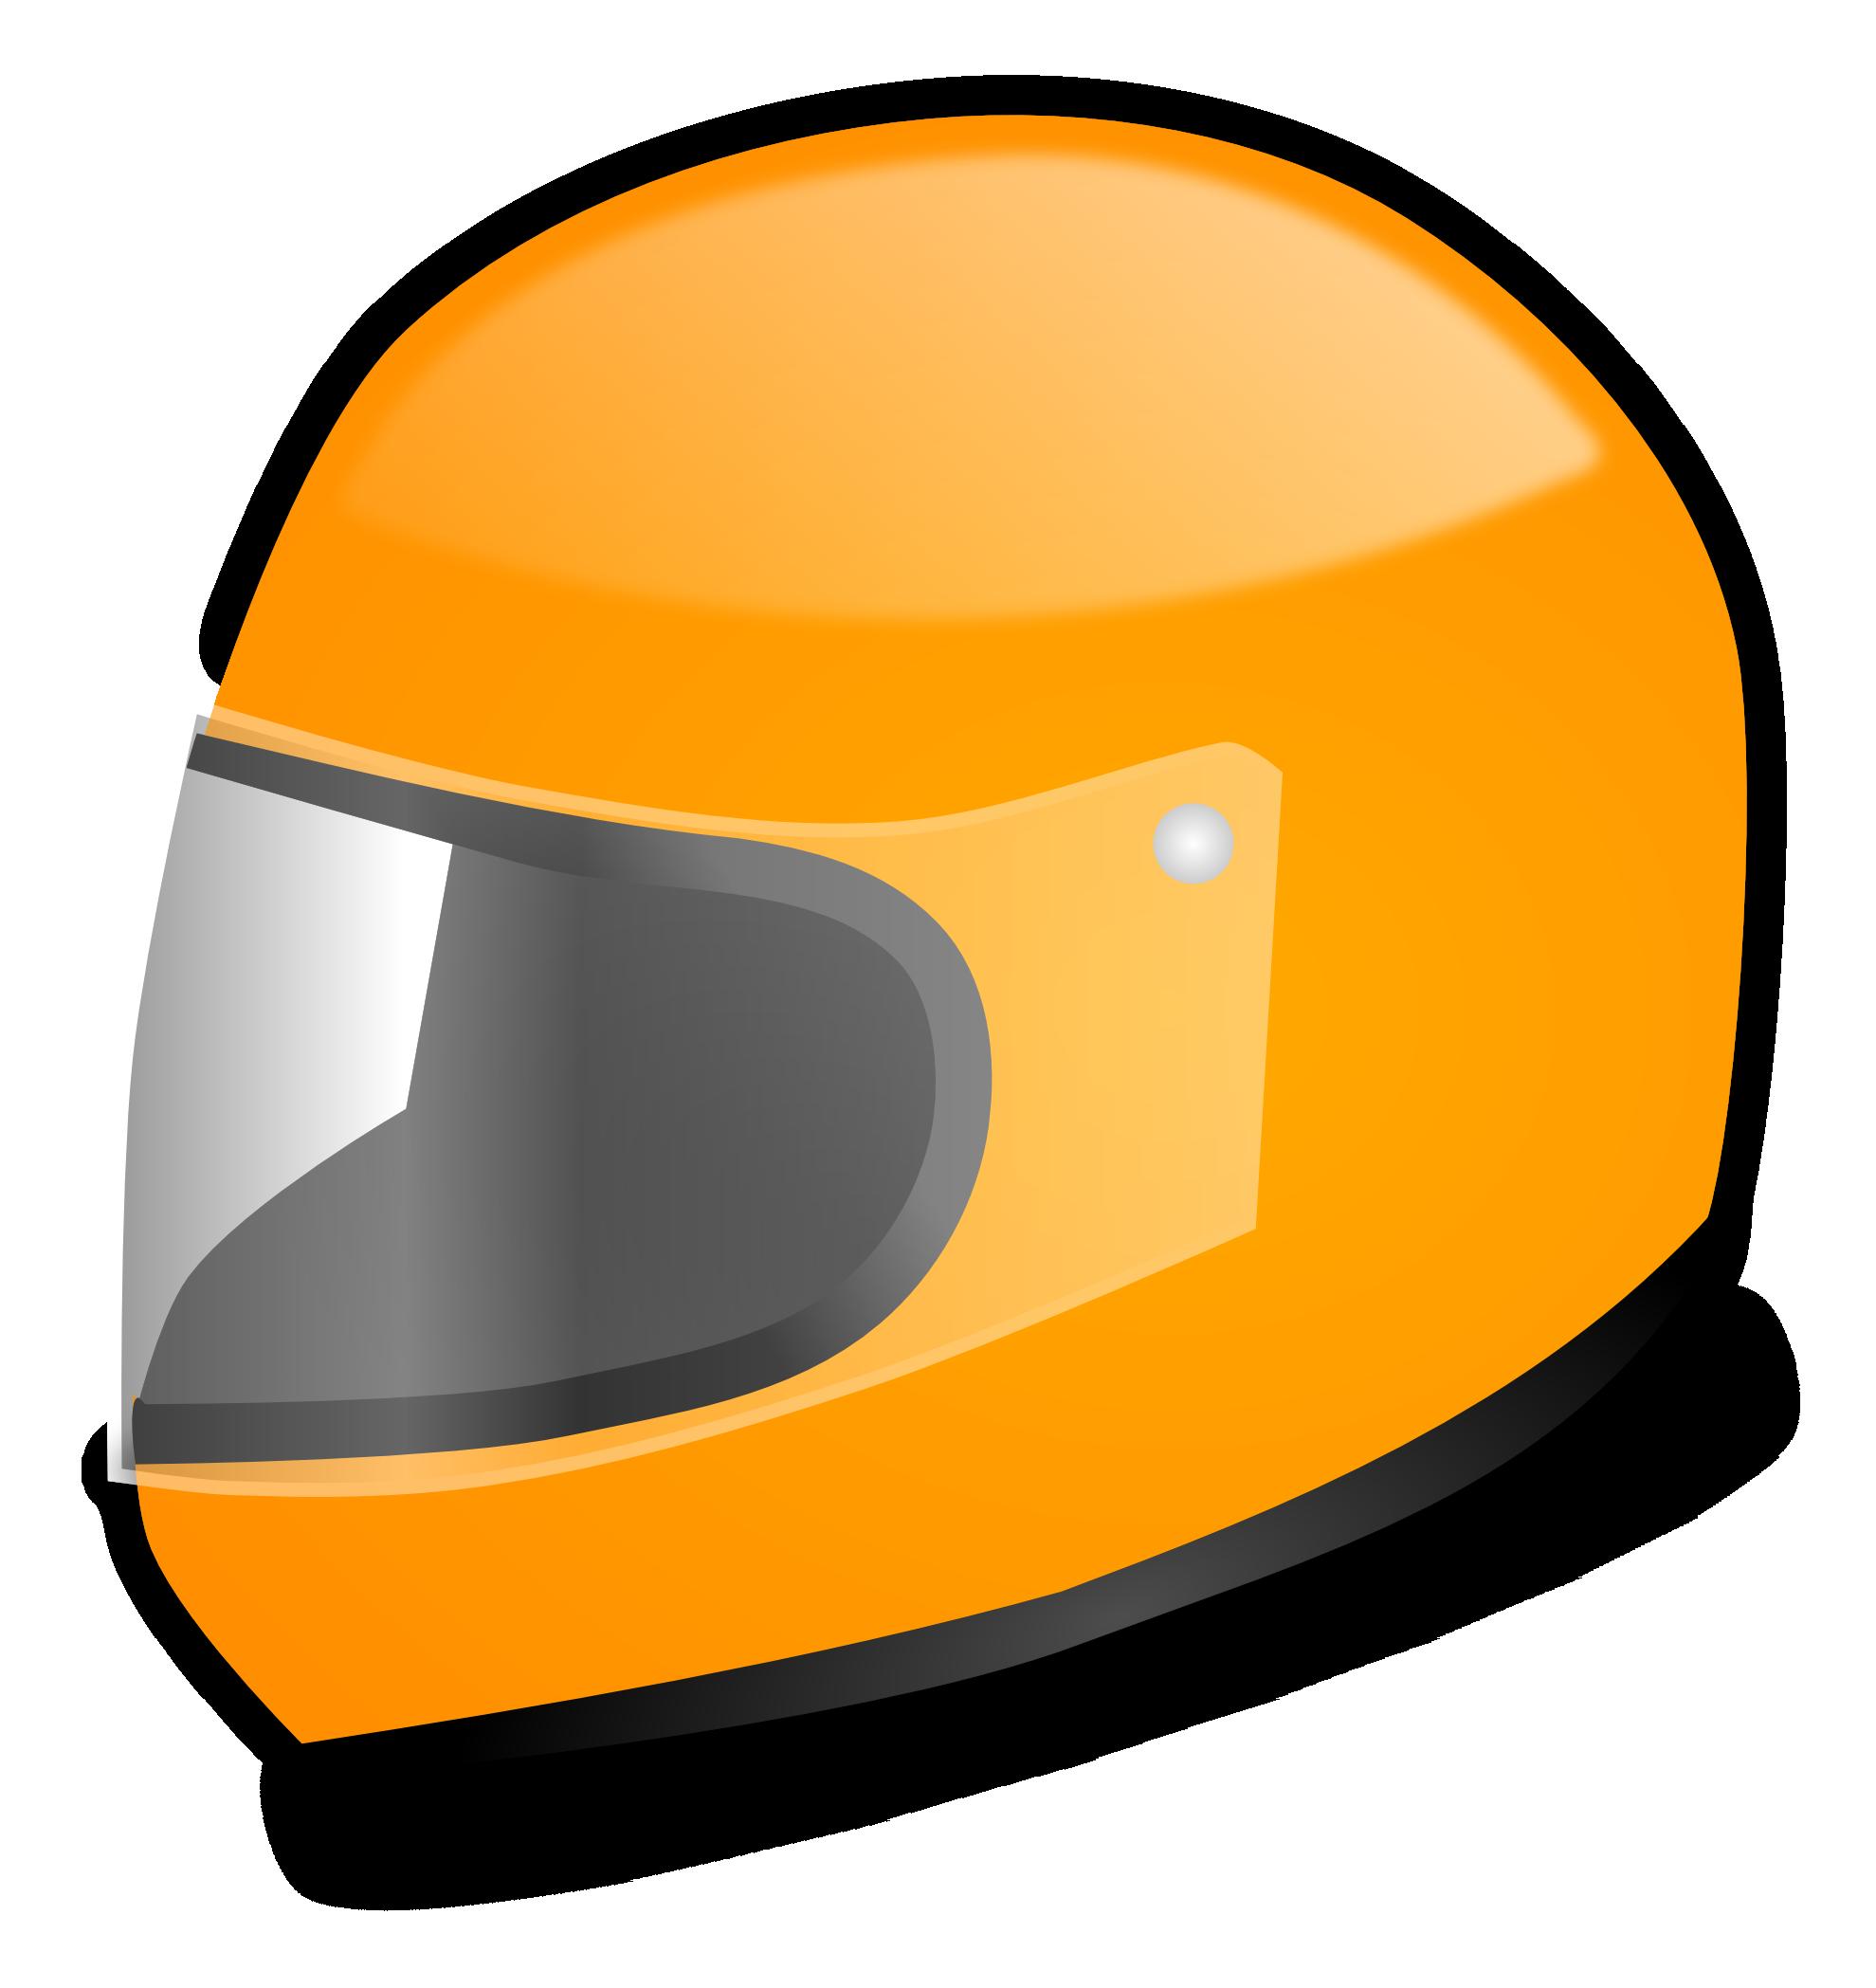 Clipart Motorcycle Helmet.